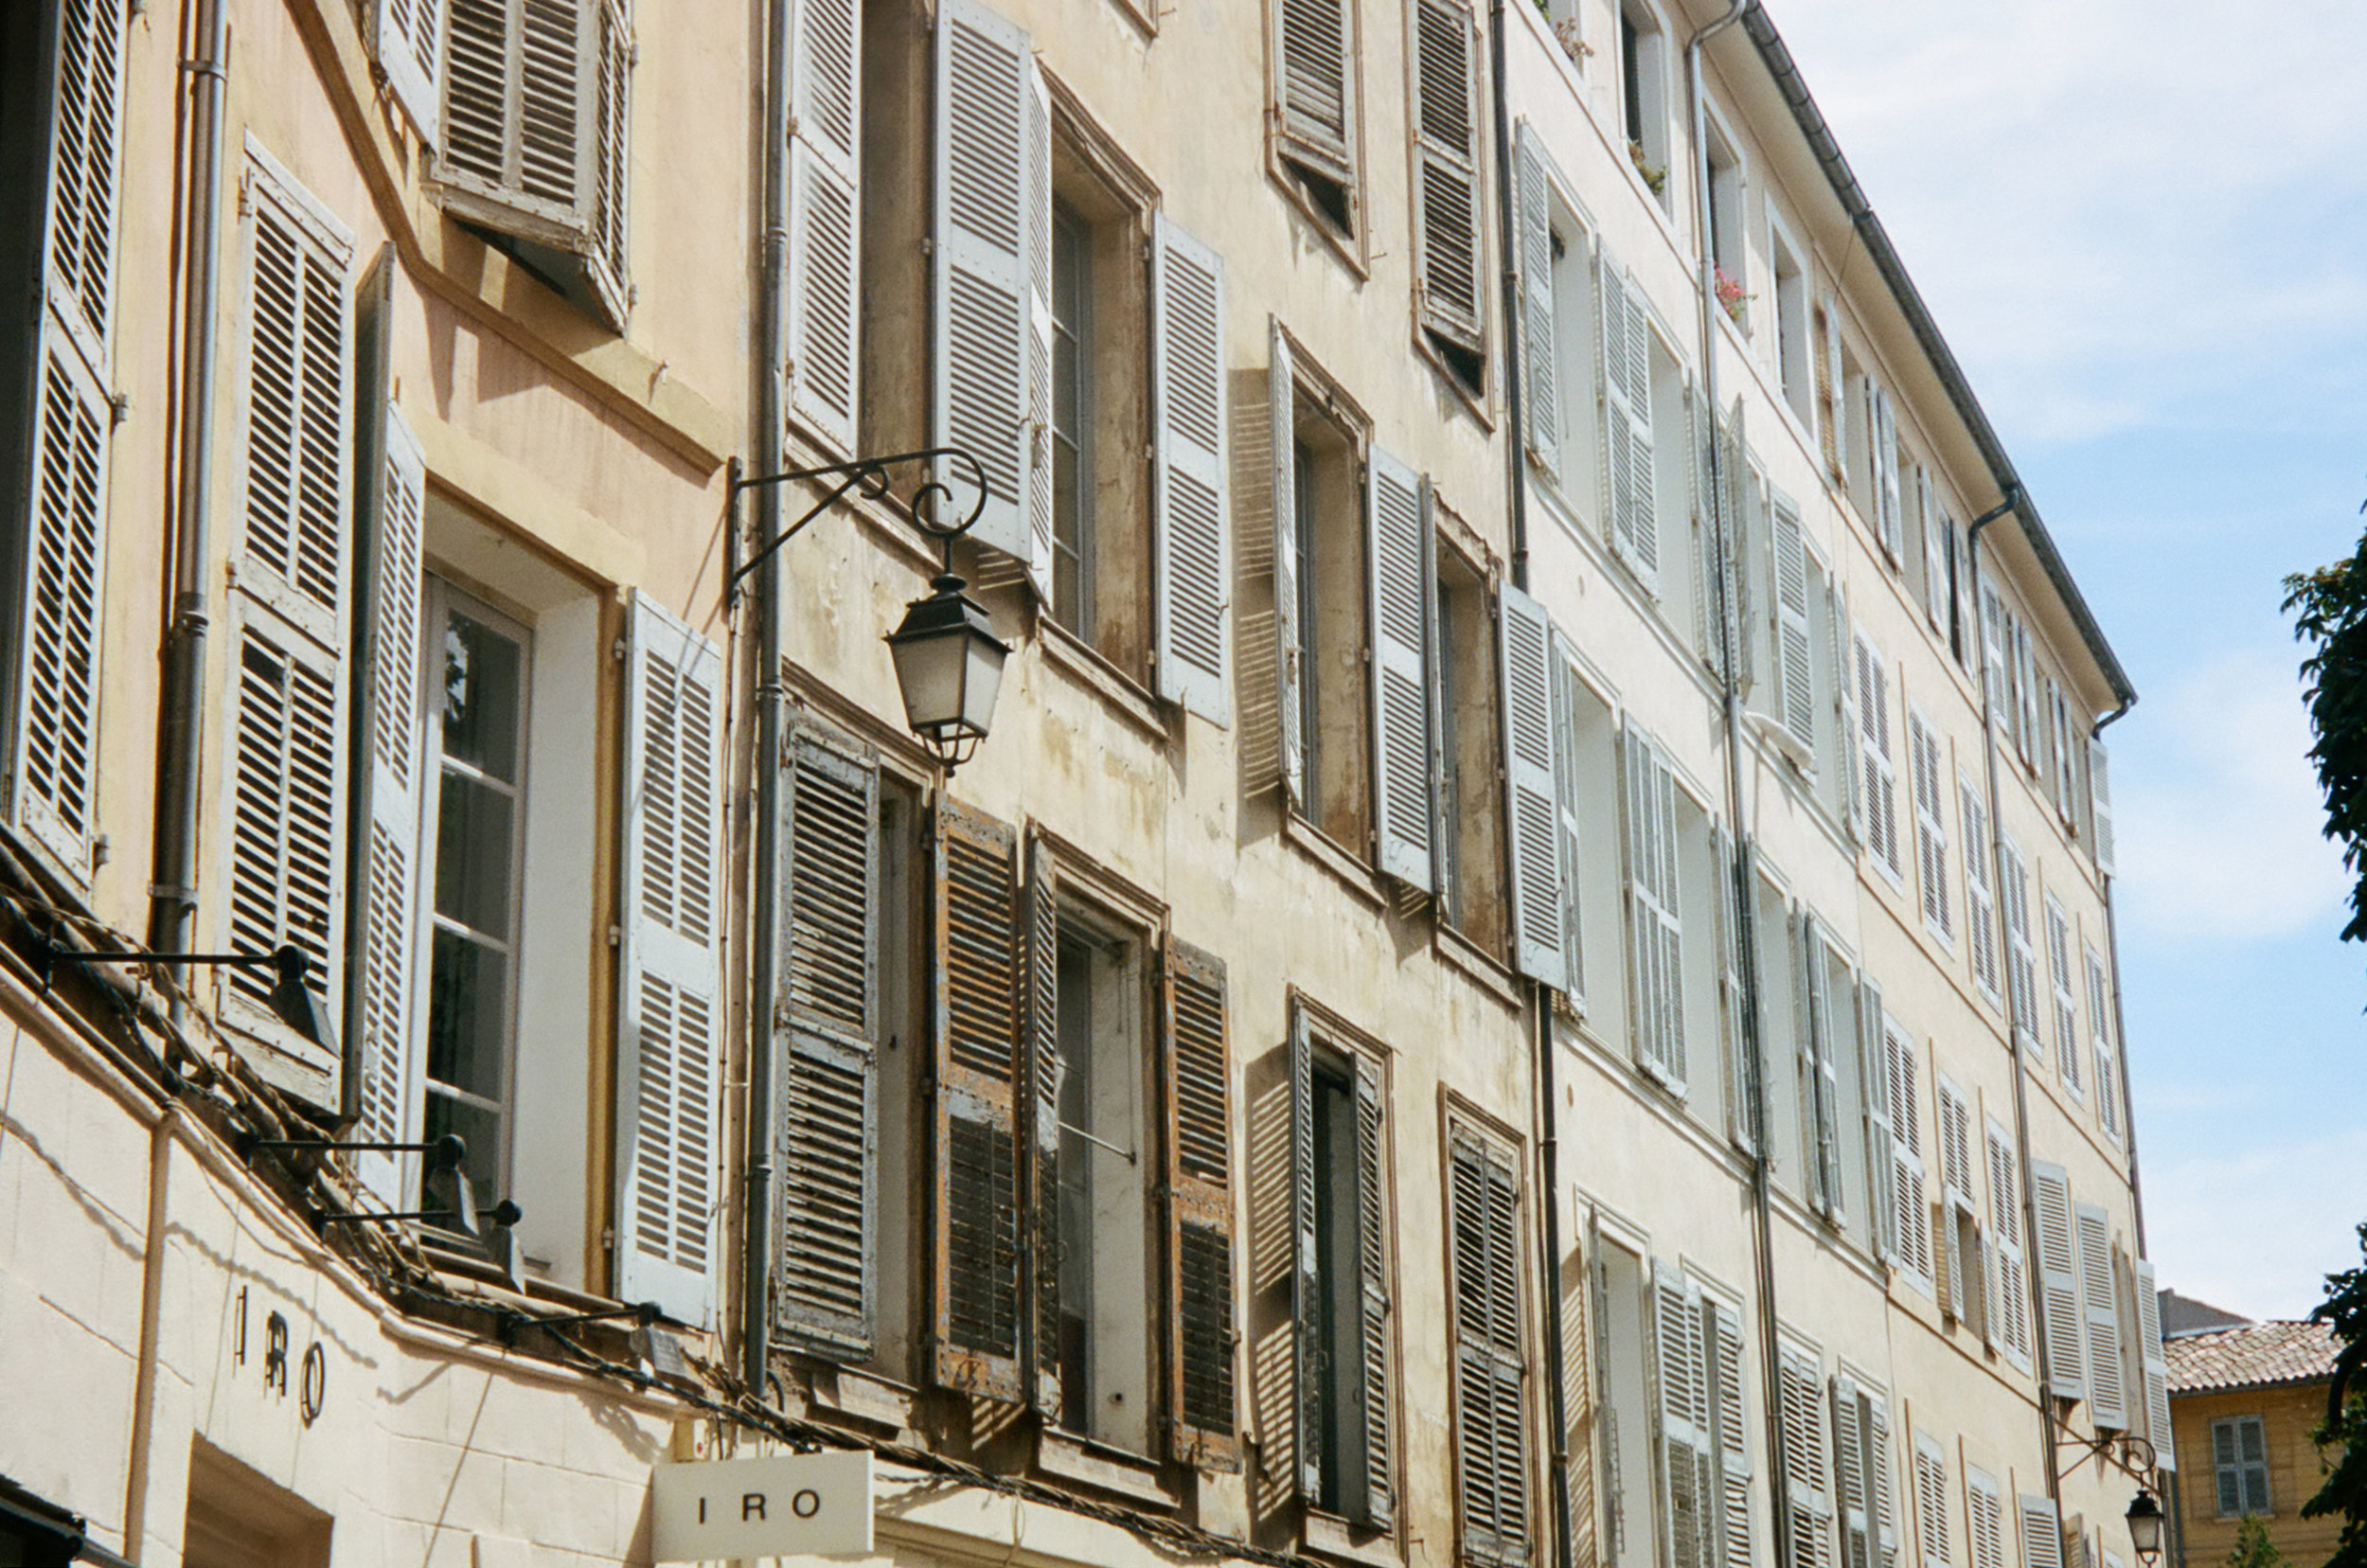 Carin_Olsson_Provence_01.jpg